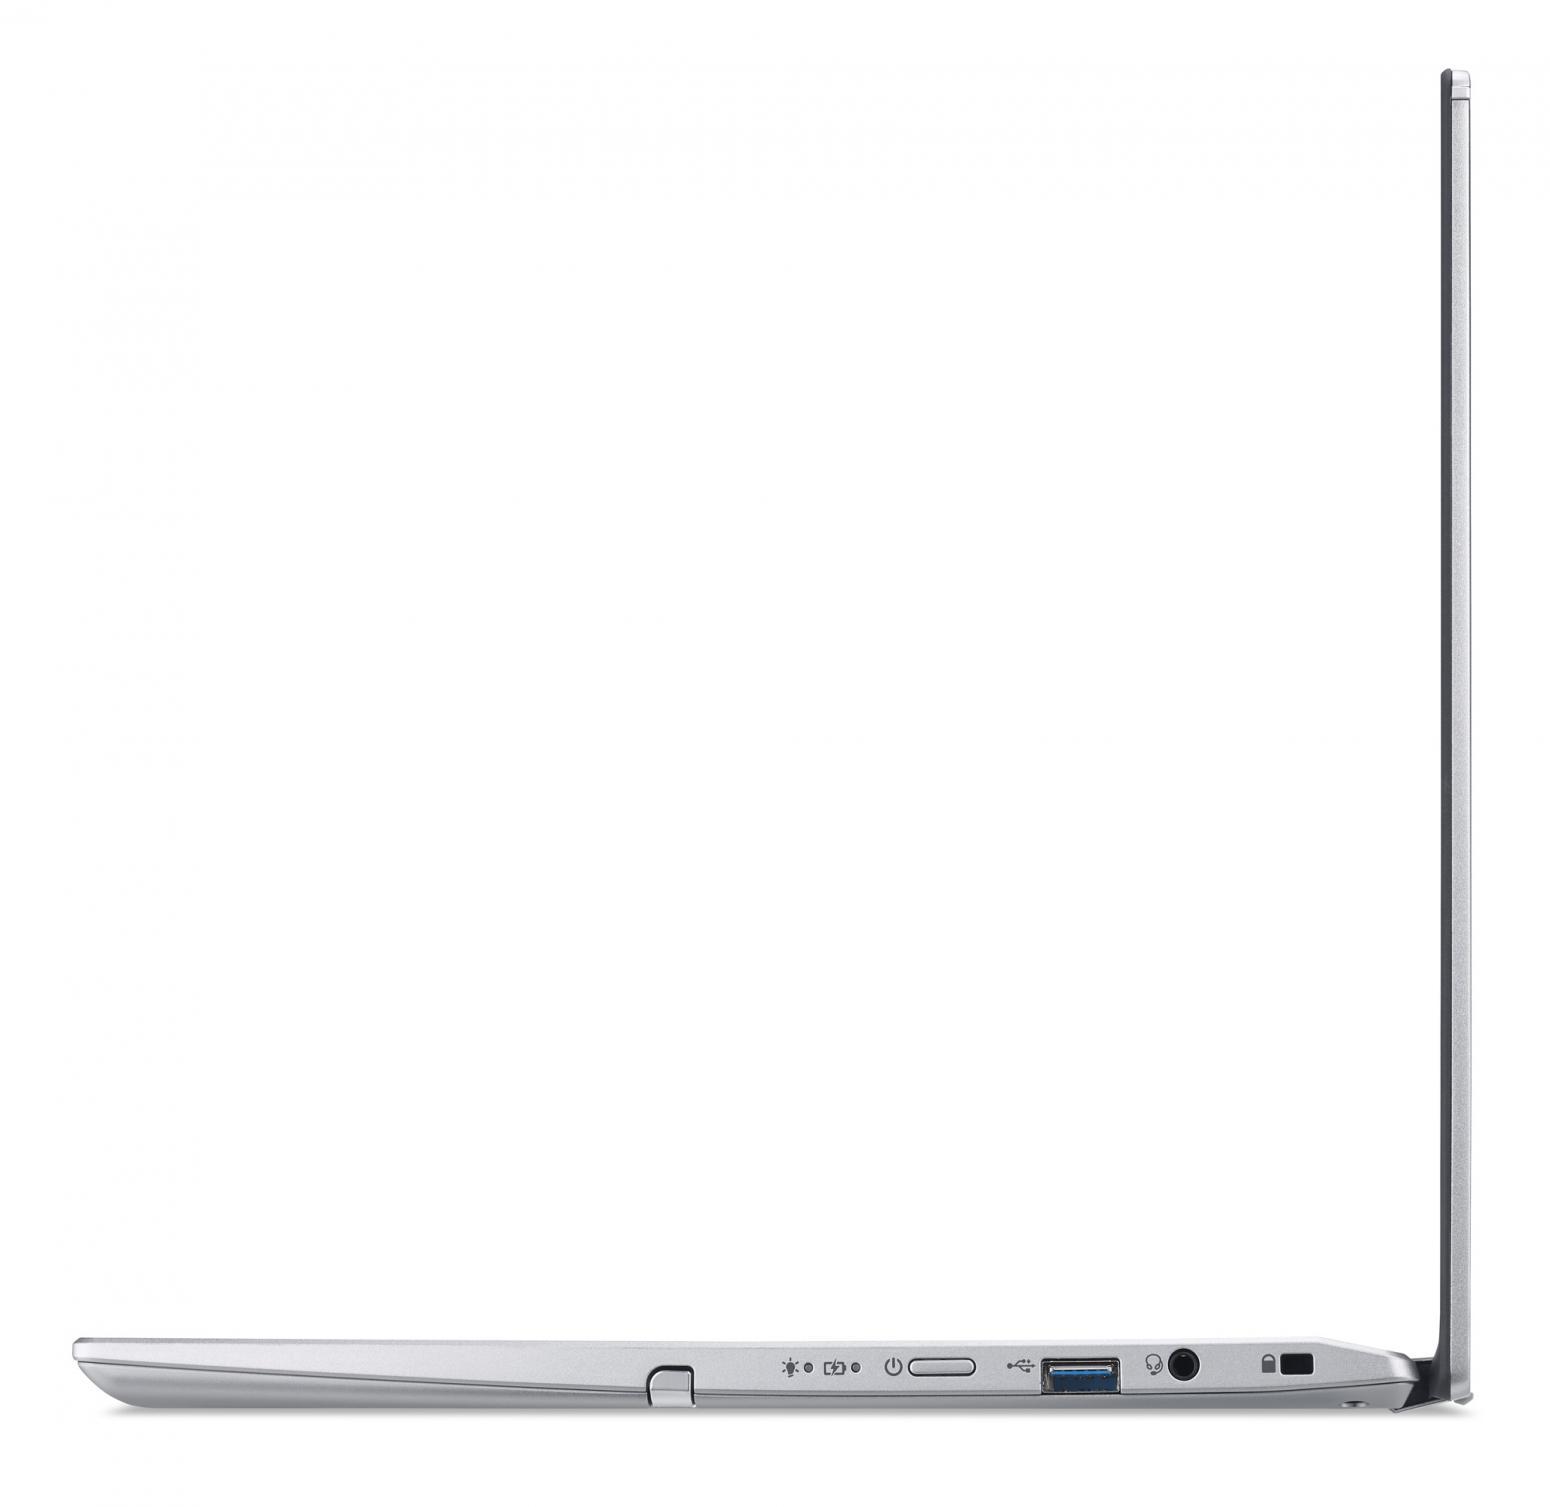 Ordinateur portable Acer Spin 3 SP314-54N-52H9 Argent - Tactile, Stylet - photo 10